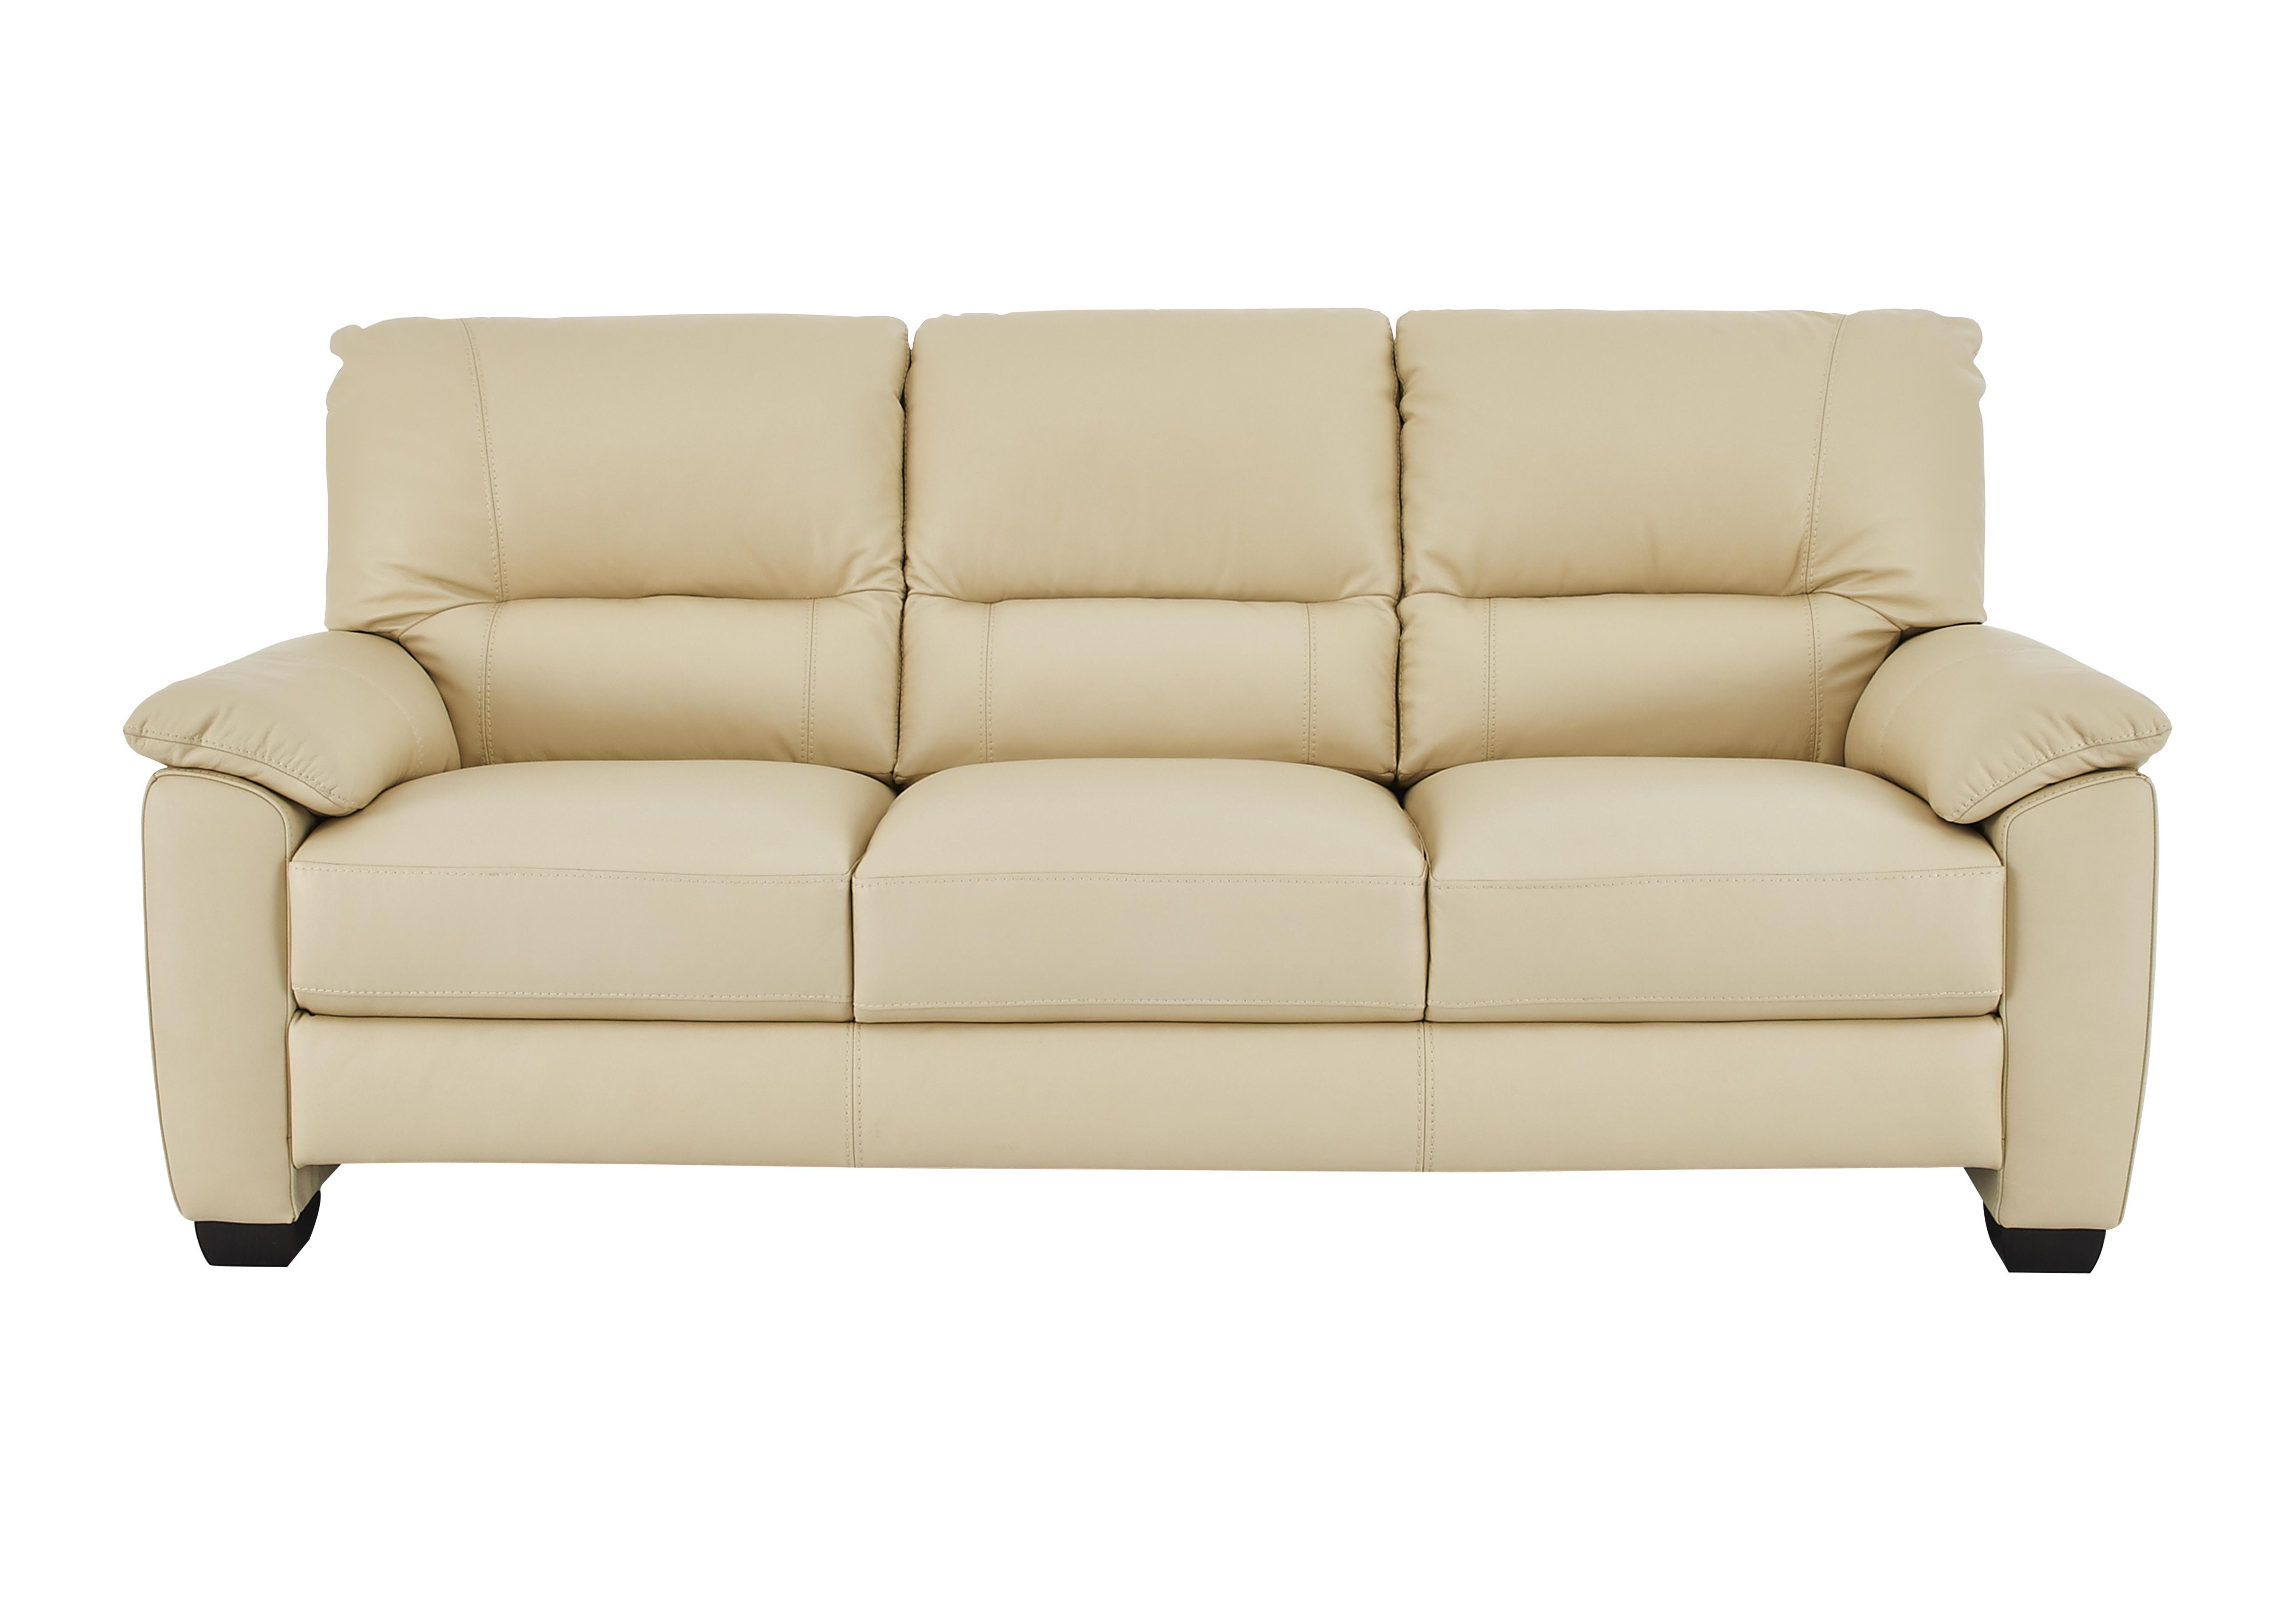 Elegant Apollo 3 Seater Leather Sofa. Loading Images